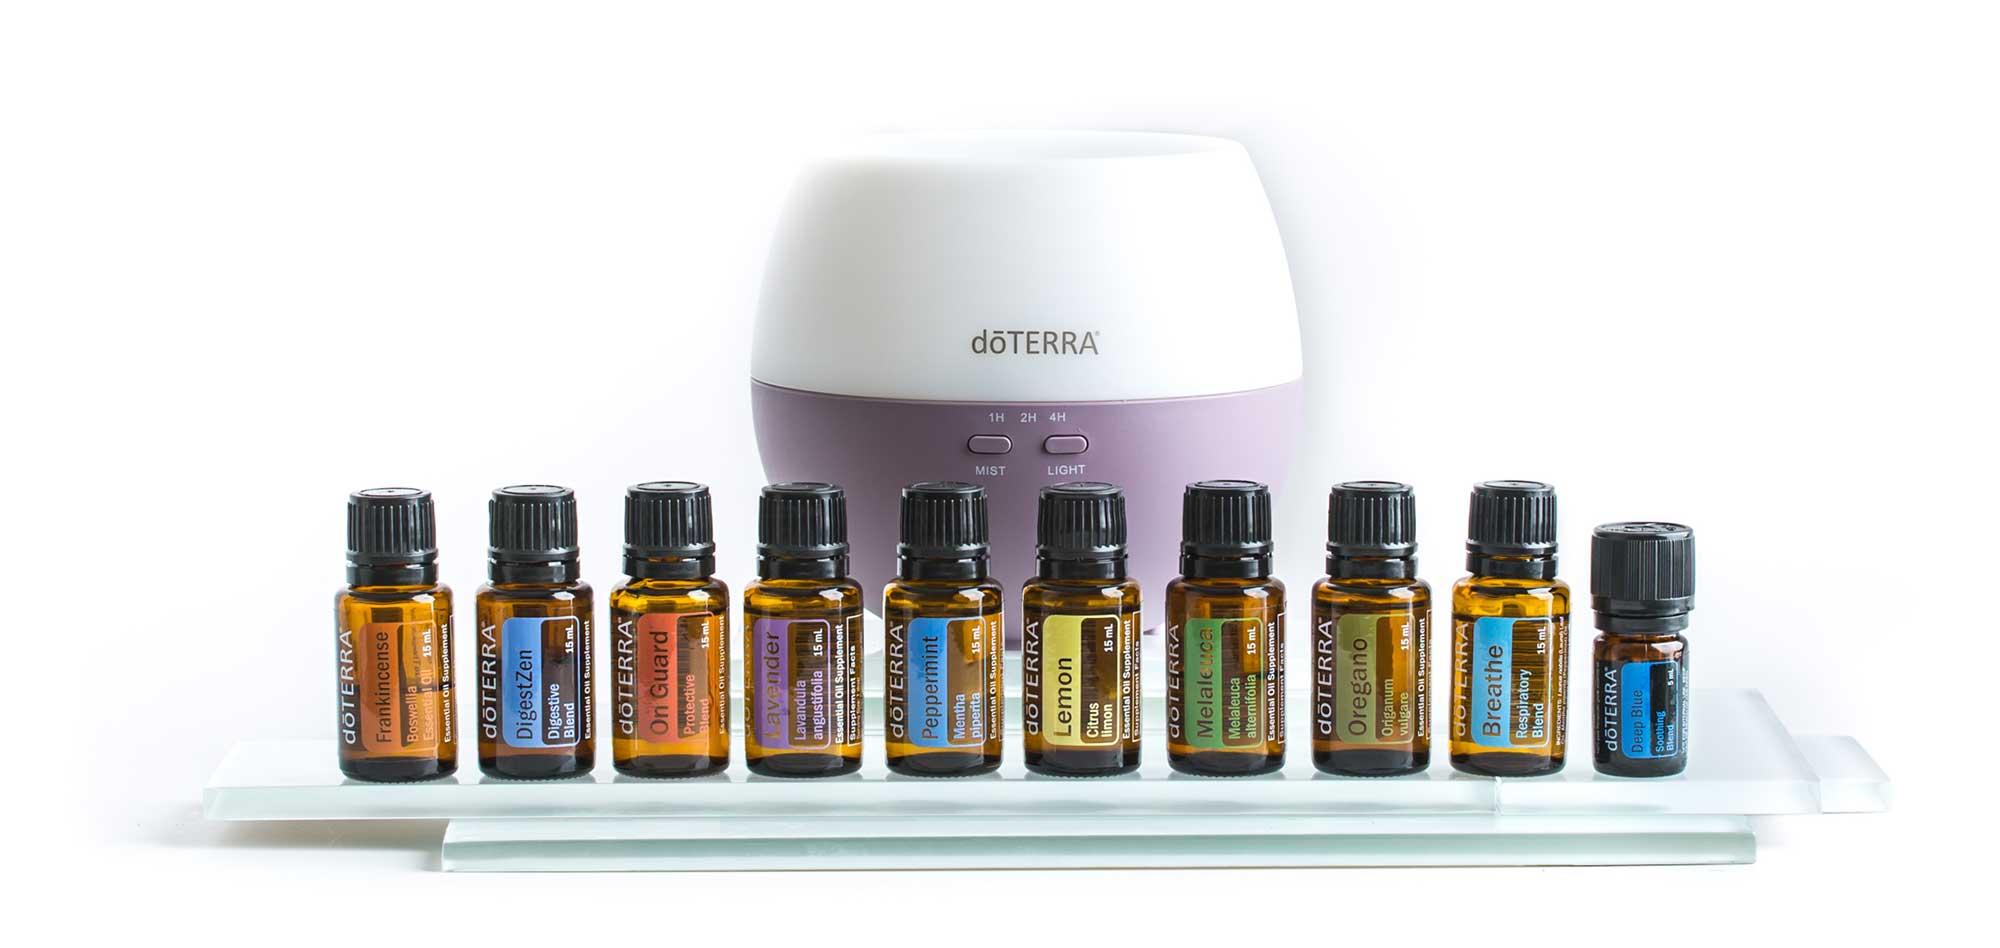 doterra-home-essentials-kit.jpg